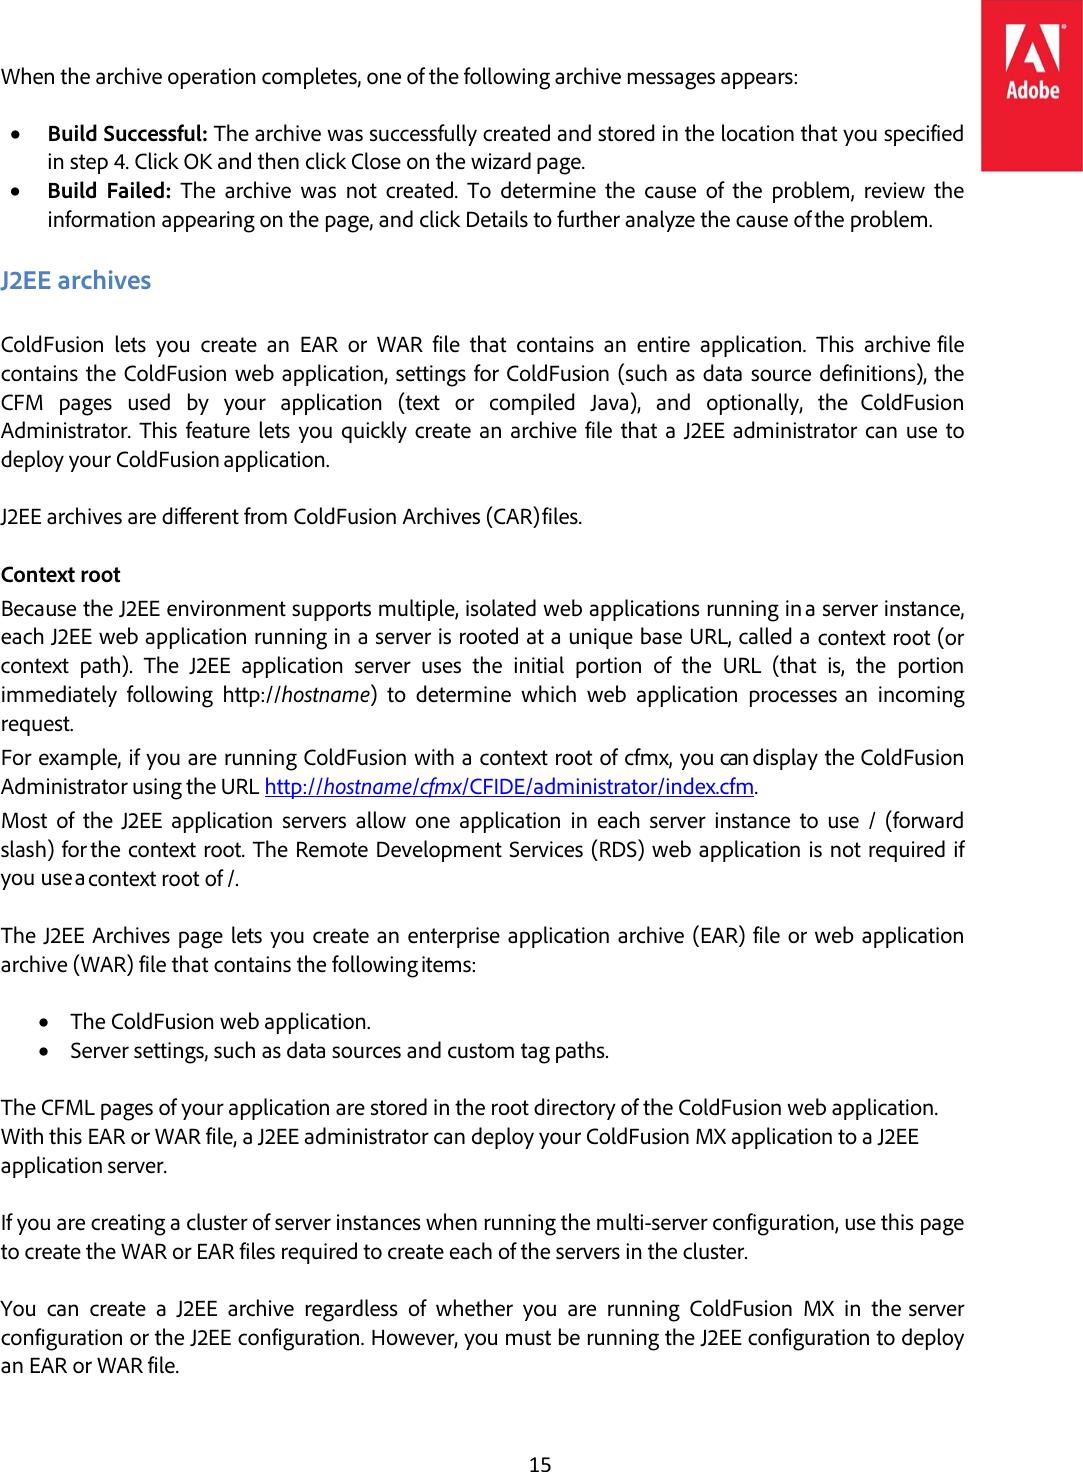 Adobe Cold Fusion 2016 Migration Guide Coldfusion2016 En